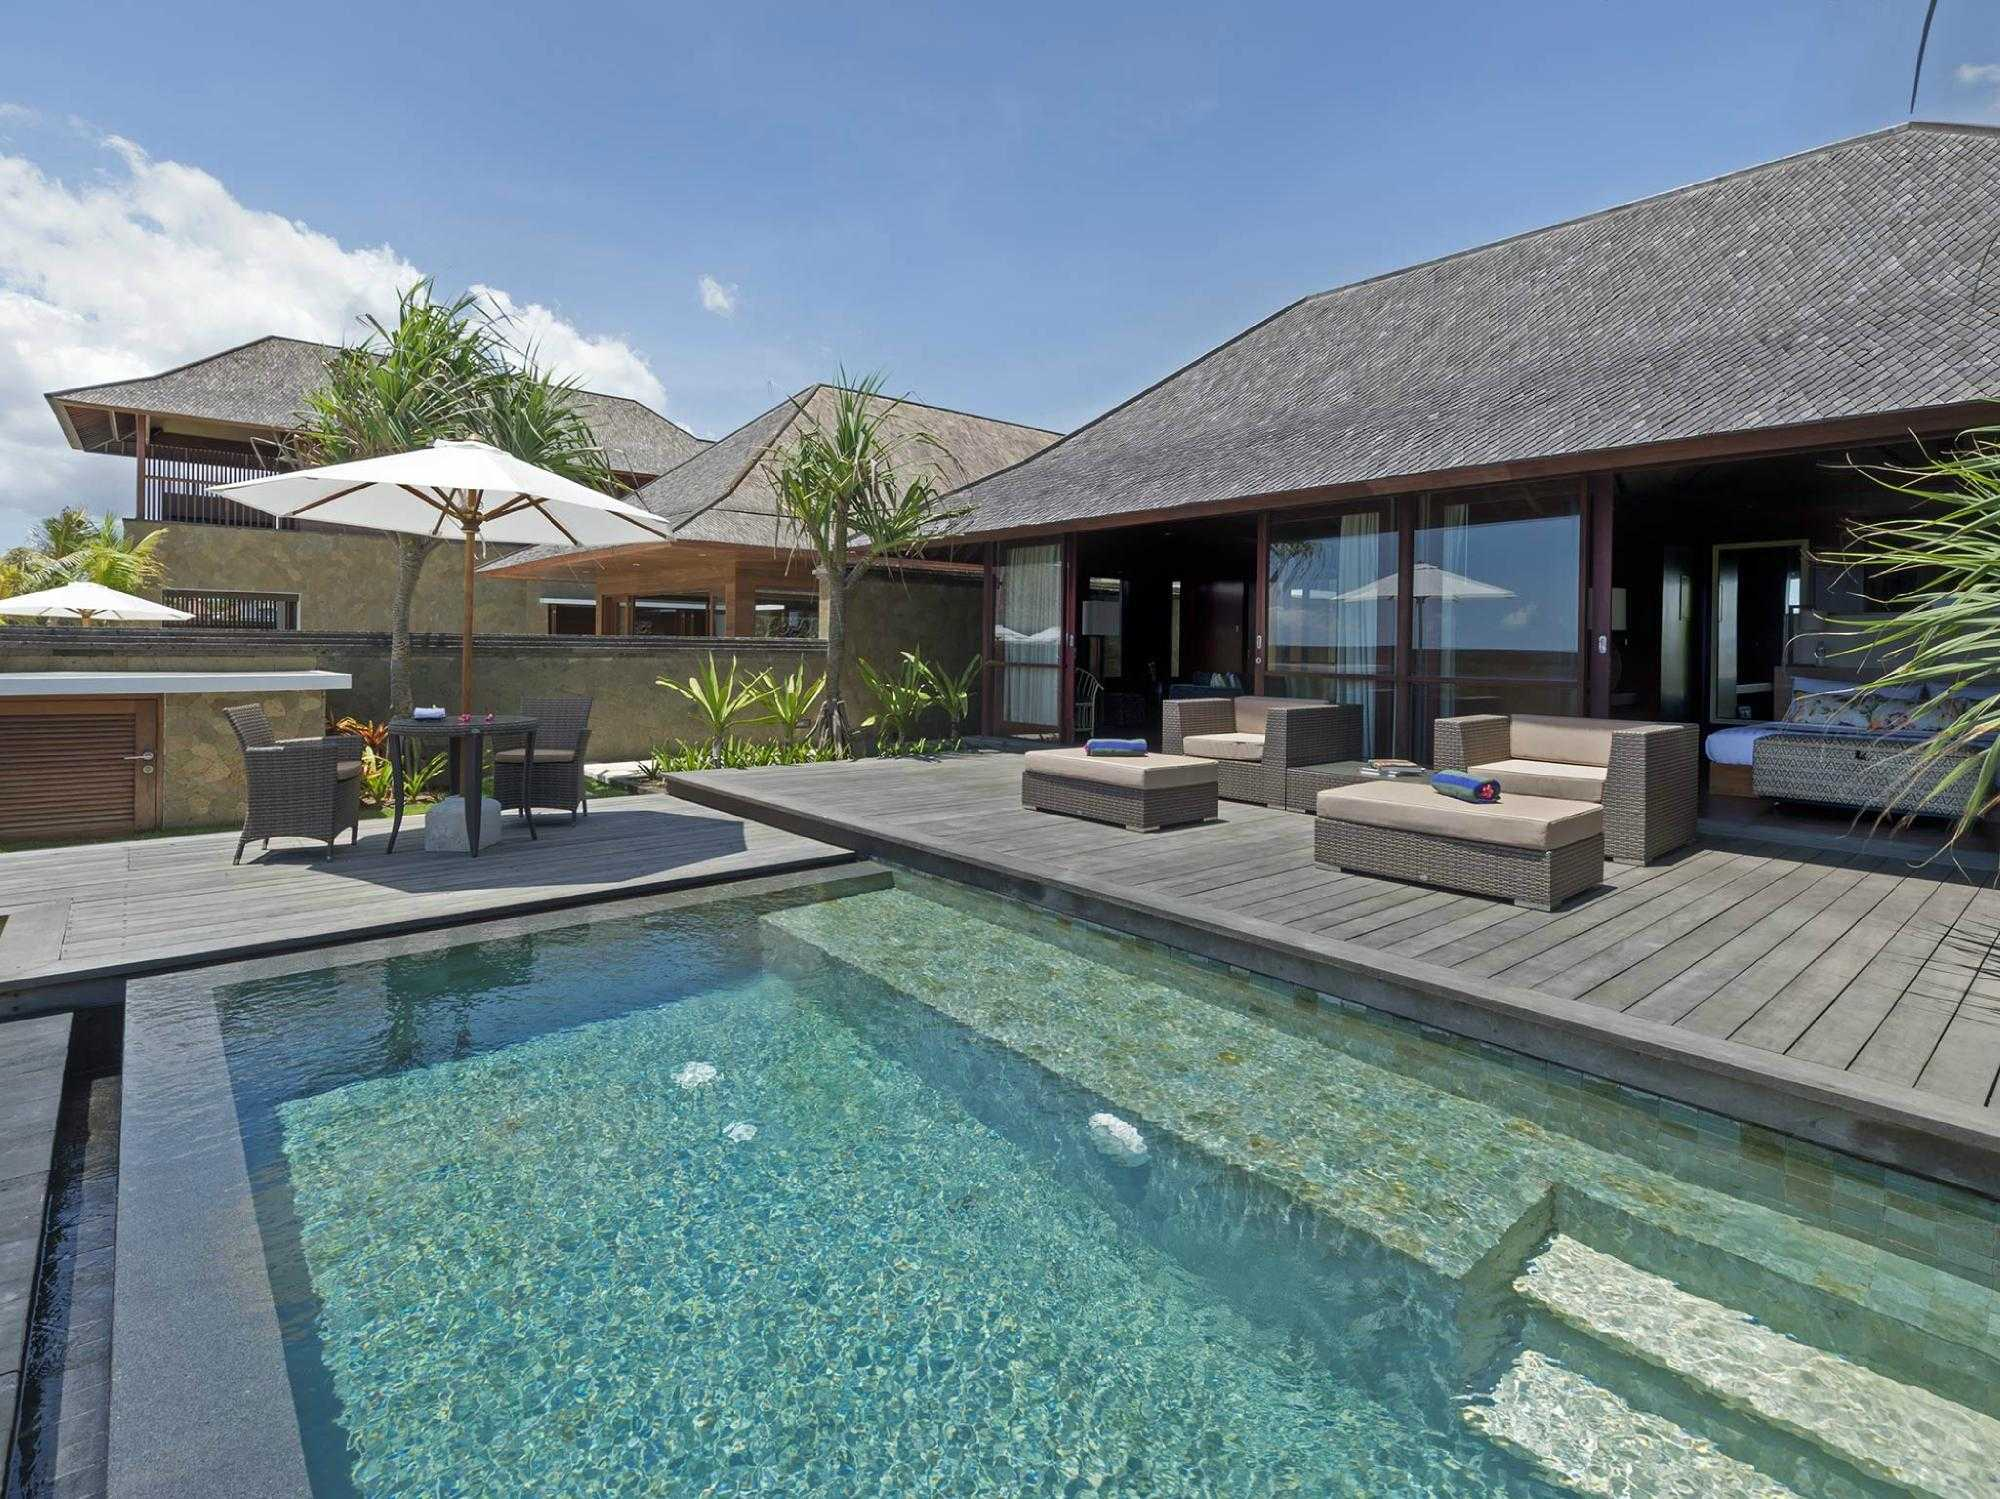 Agung Budi Raharsa | Architecture & Engineering Bayu Gita Villa - Bali Bali, Indonesia Bali, Indonesia Agung-Budi-Raharsa-Bayu-Gita-Villa-By-Agung-Budi-Raharsa-With-Csa  88347